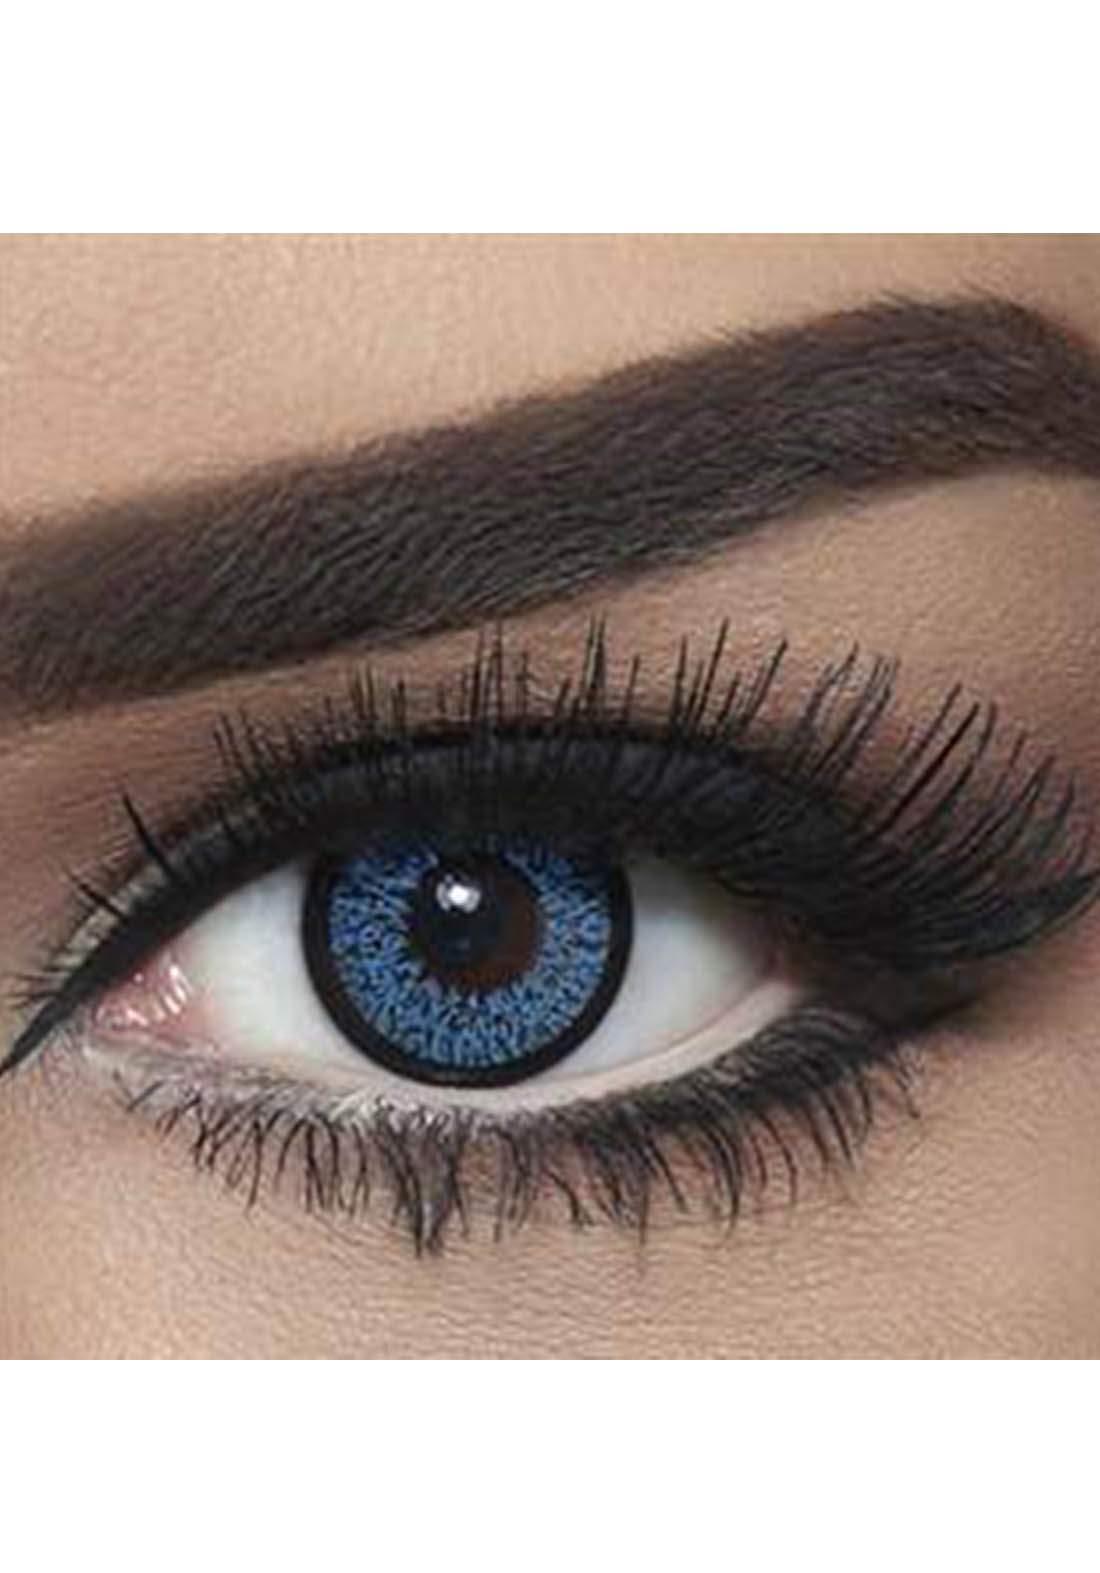 Bella Classic 301016 Contact Lenses 3 Months Use High Light -Blue No.17 عدسات لاصقة